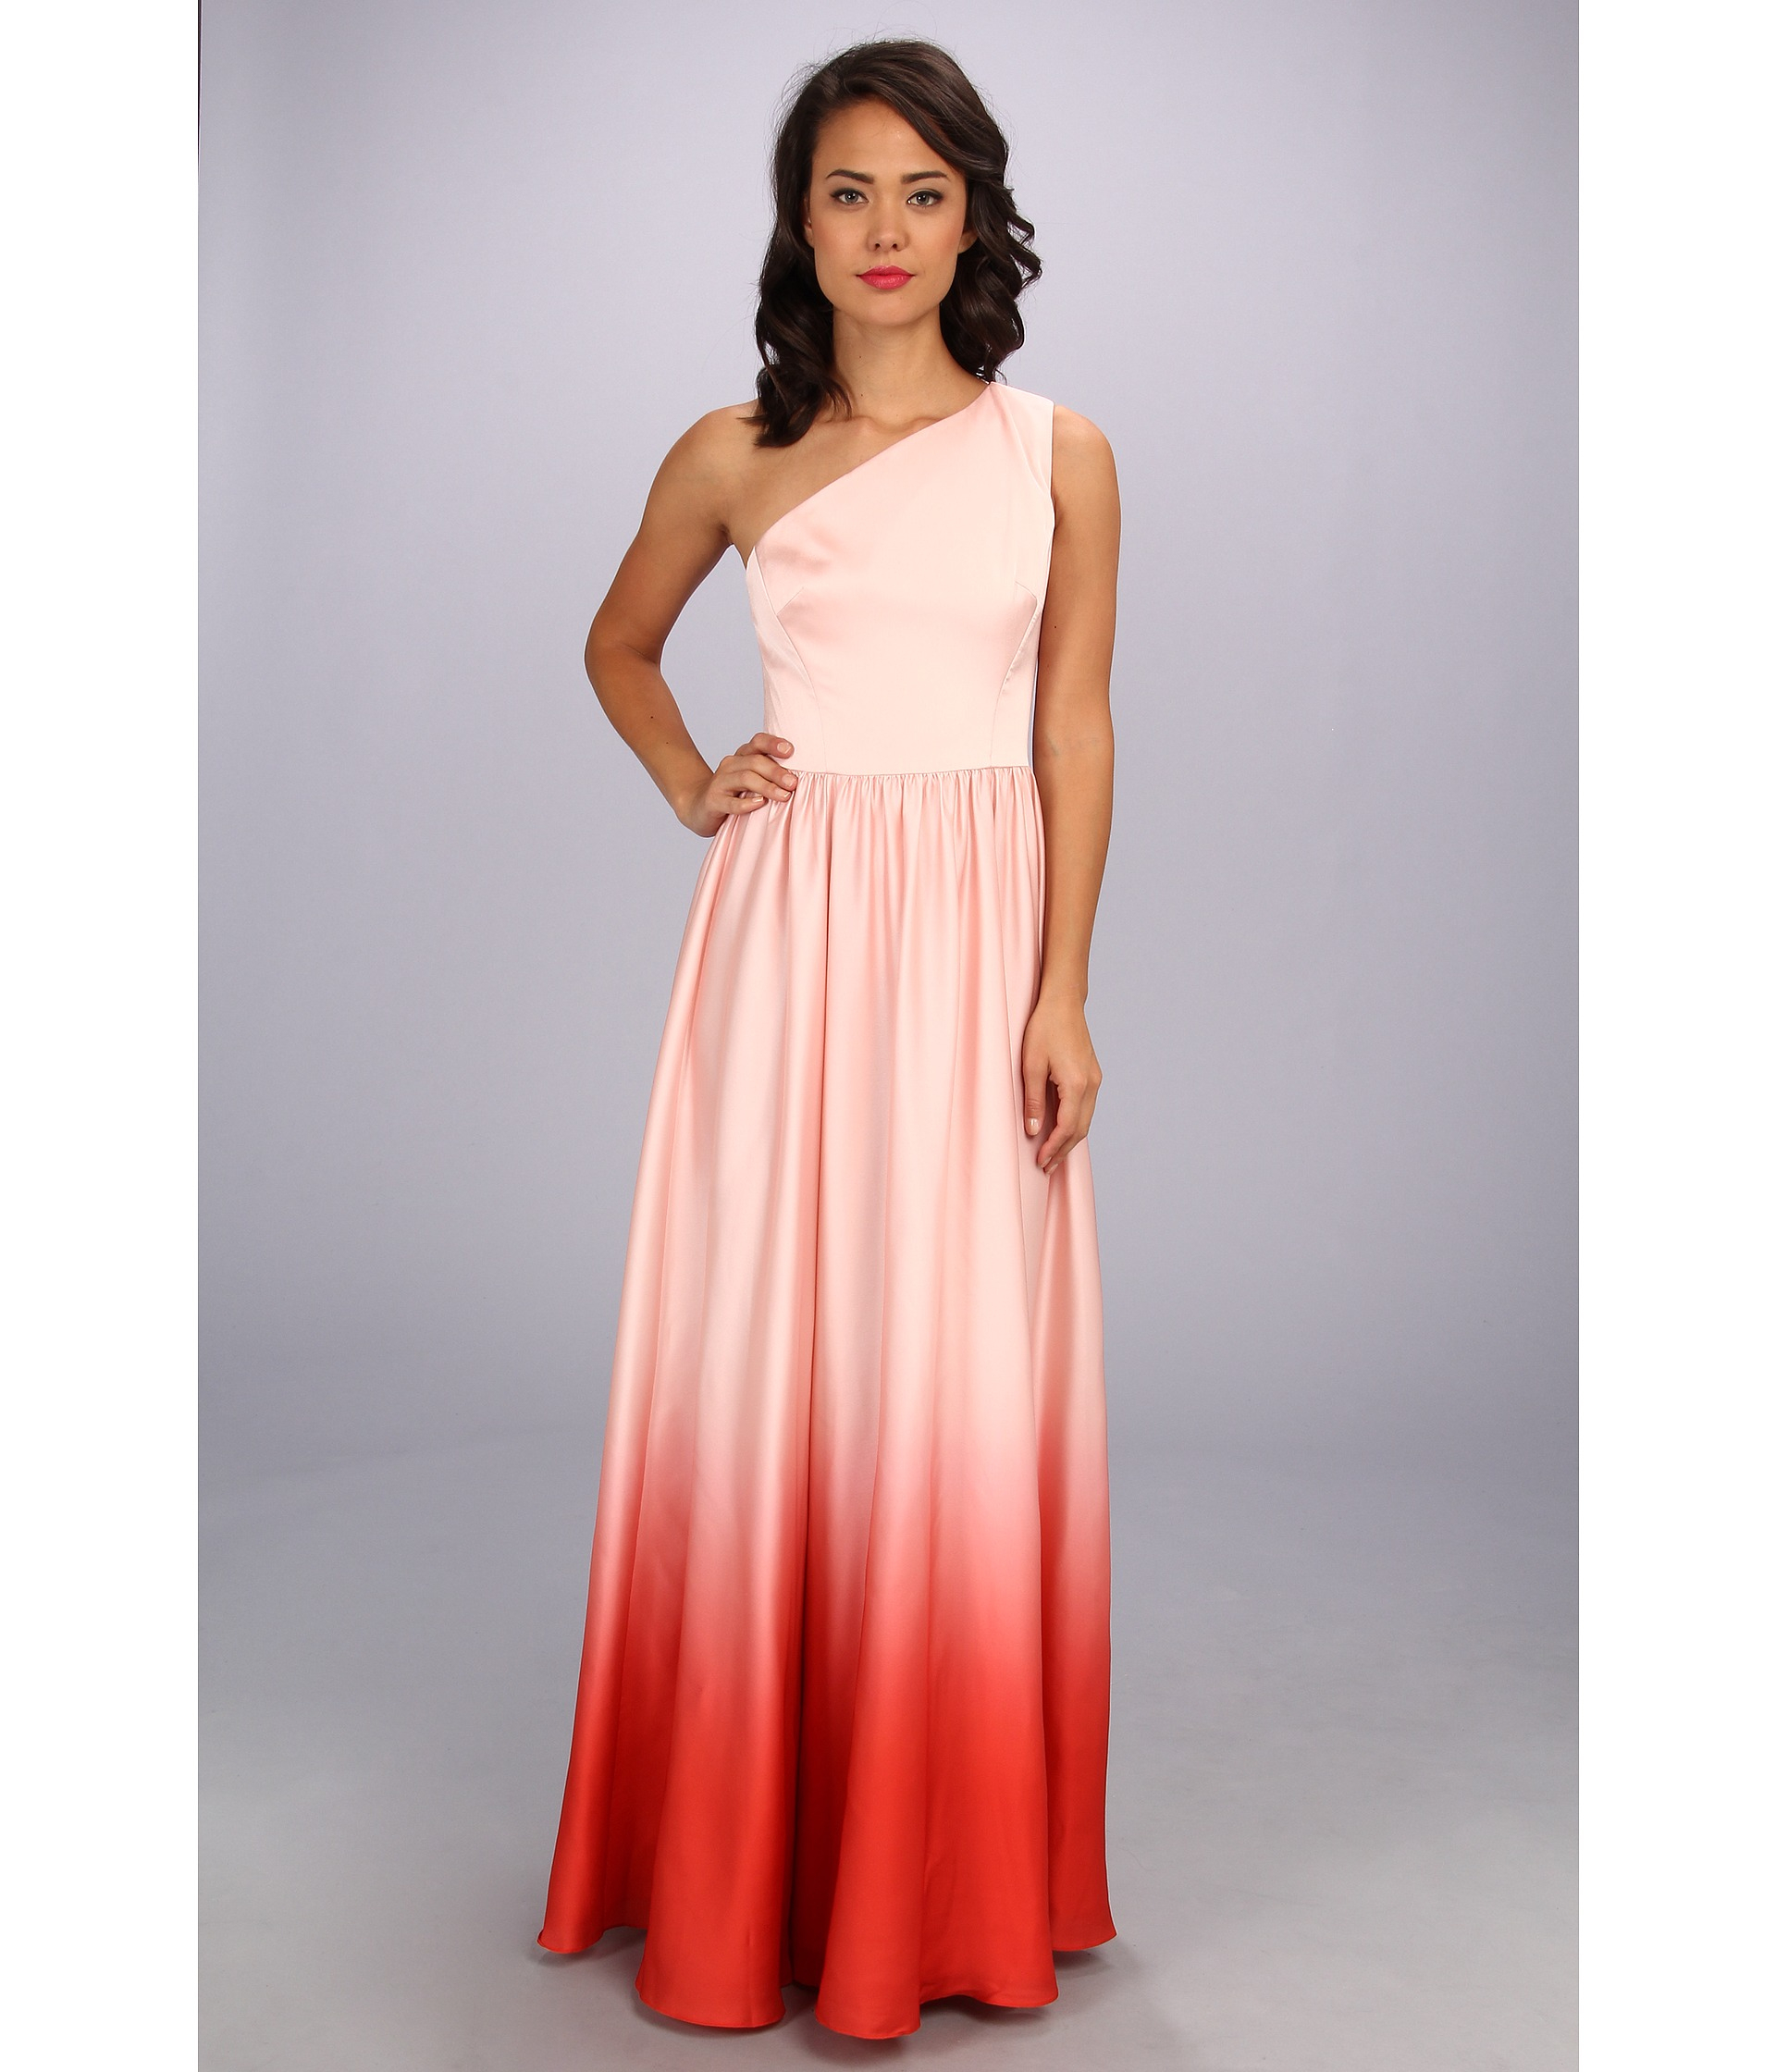 Ted baker Daneka Single Shoulder Ombre Maxi Dress in Pink | Lyst